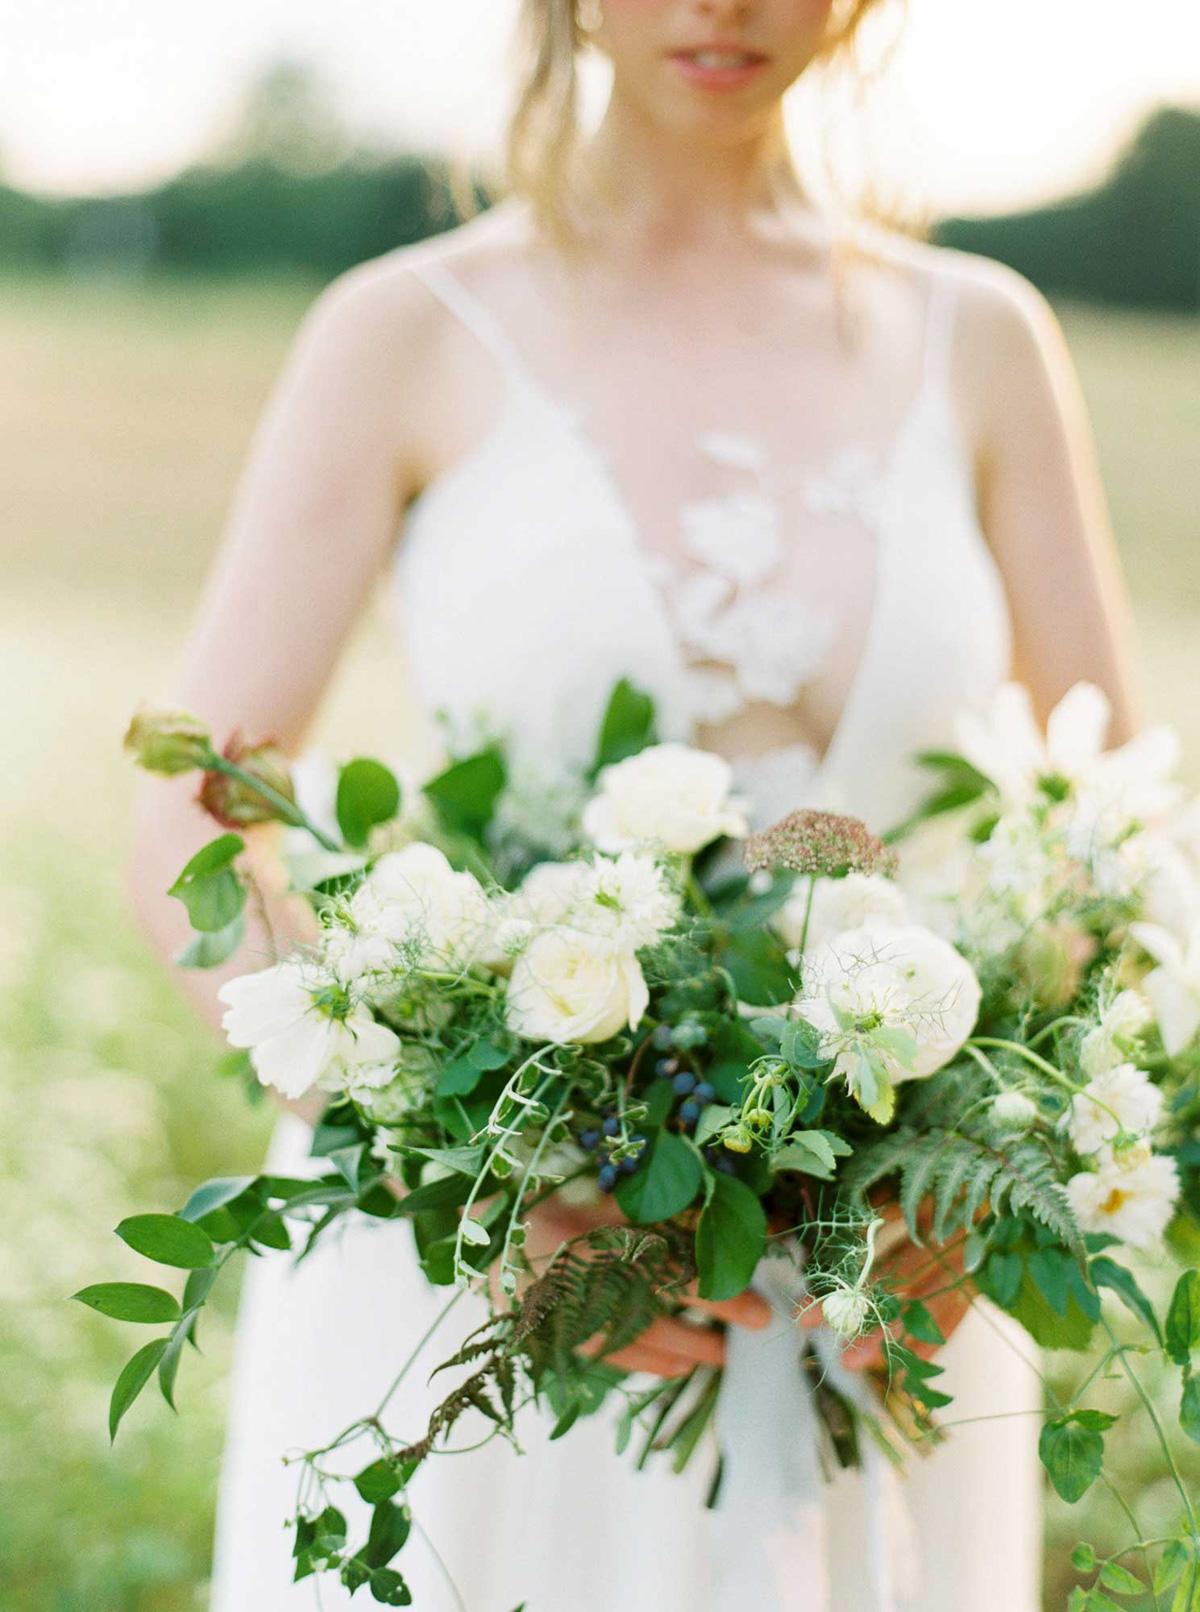 kayla-yestal-vineyard-bride-swish-list-woodland-weddings-niagara-wedding-editorial-41.jpg